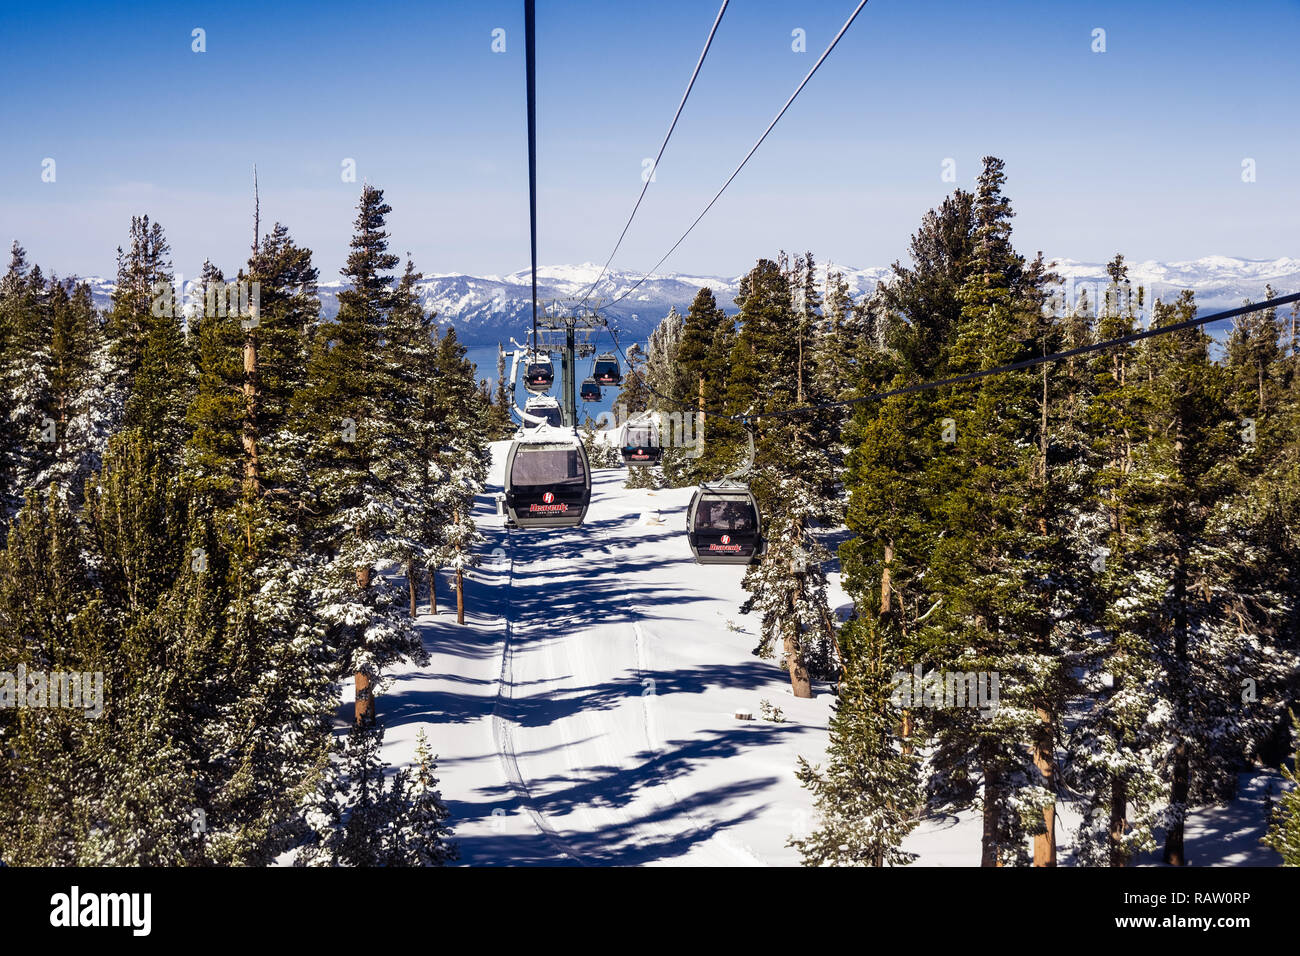 heavenly ski resort stock photos & heavenly ski resort stock images